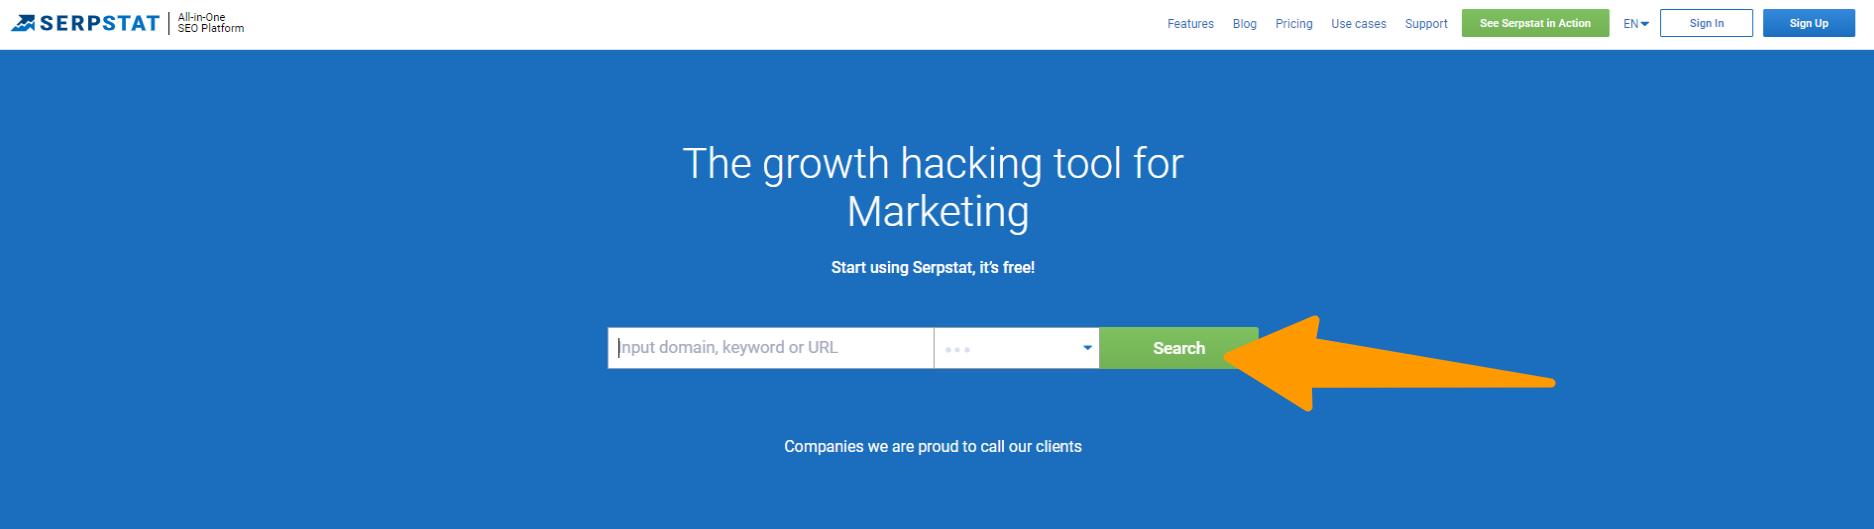 Serpstat-—-Growth-hacking-tool-